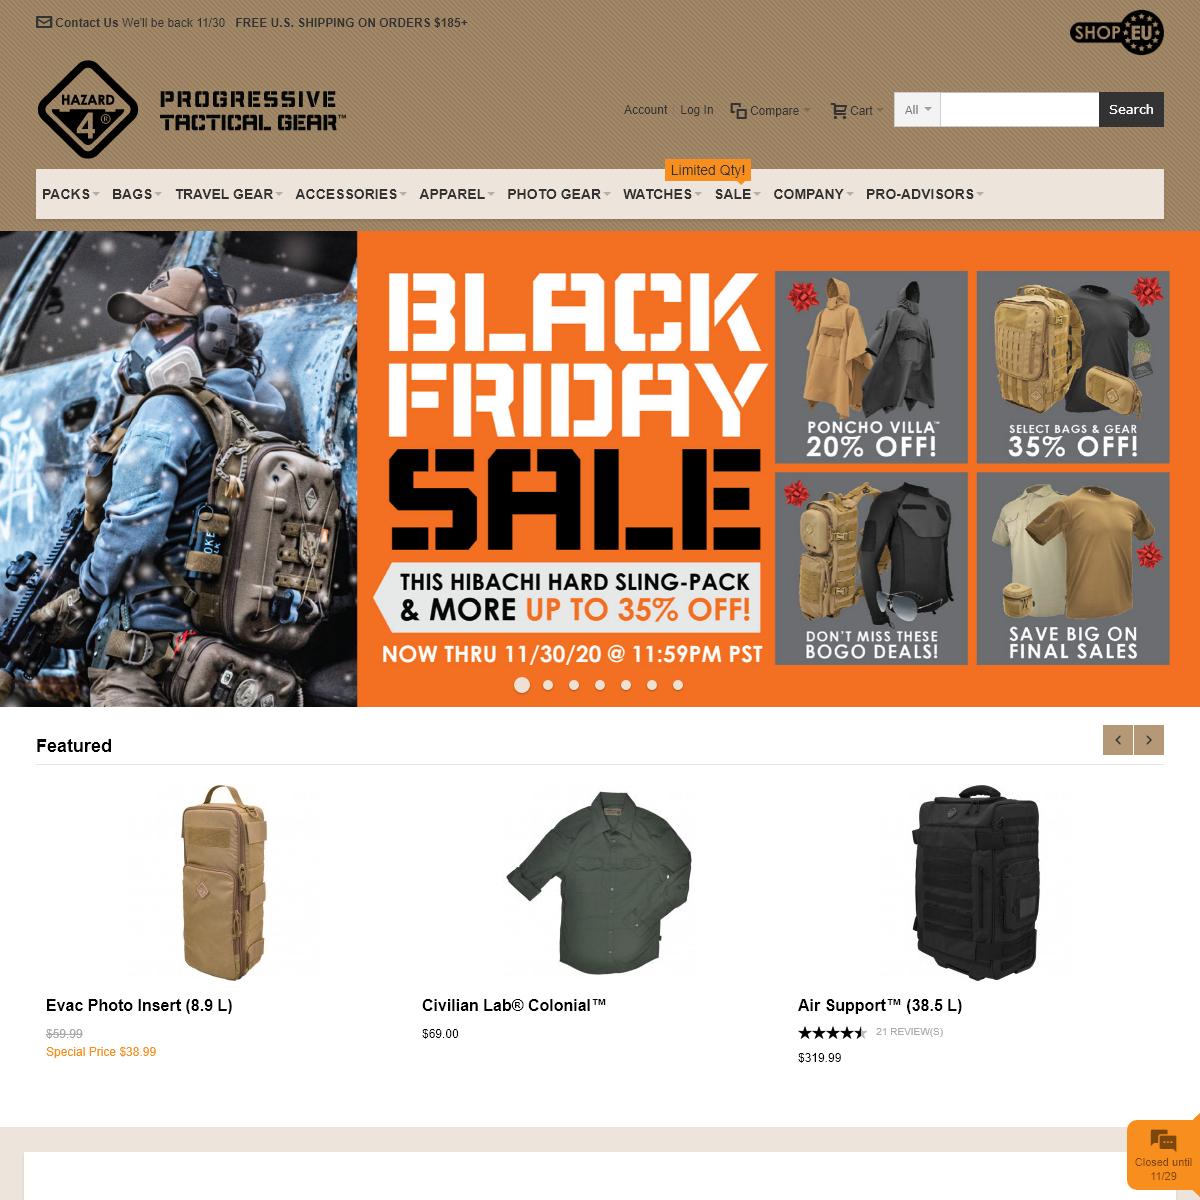 Tactical Gear - Travel Packs - Bags - Apparel - Hazard 4®